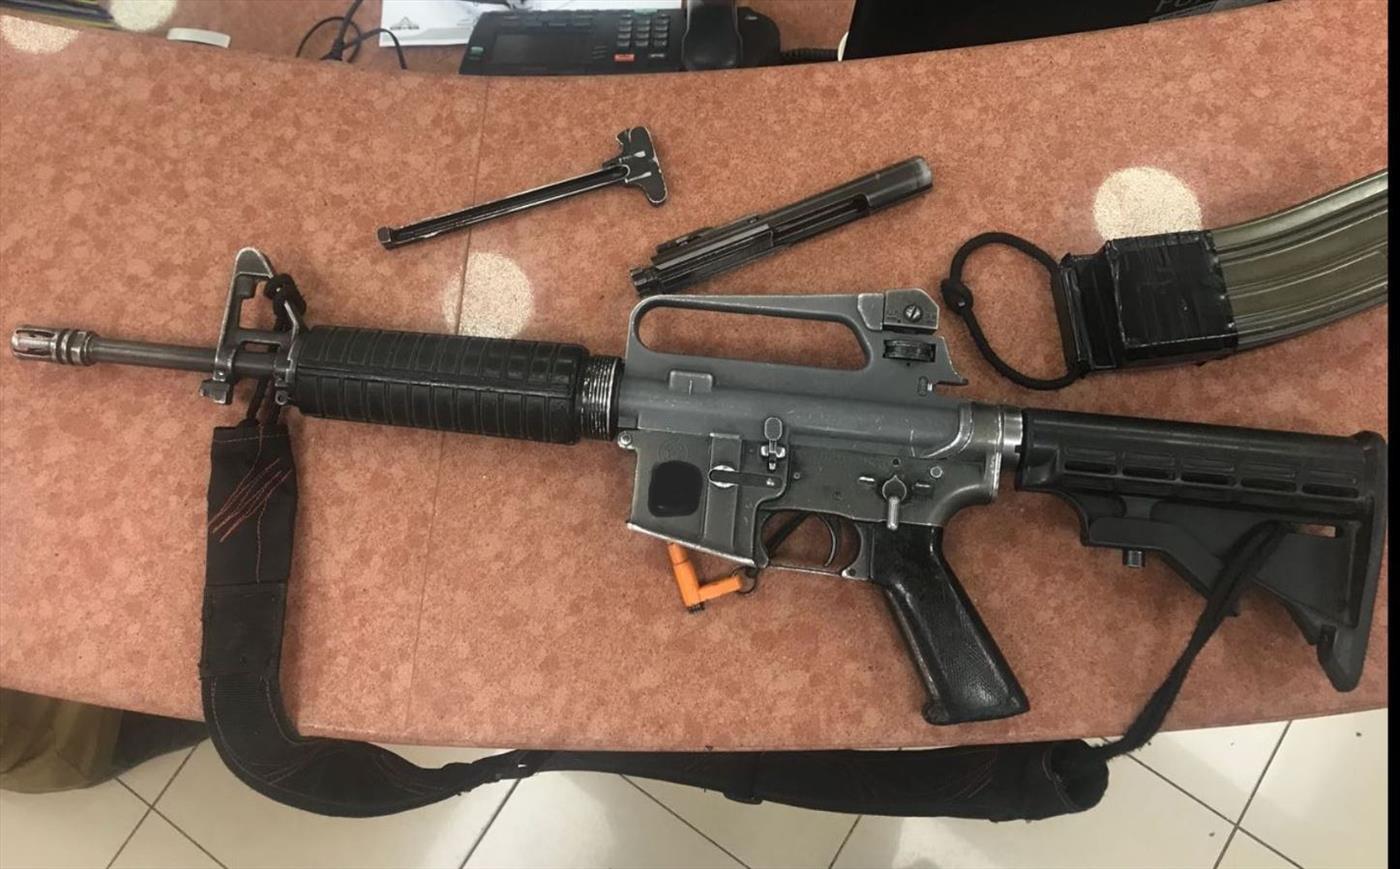 M-16 שנתפס אצל ערבים. ארכיון (דוברות המשטרה)